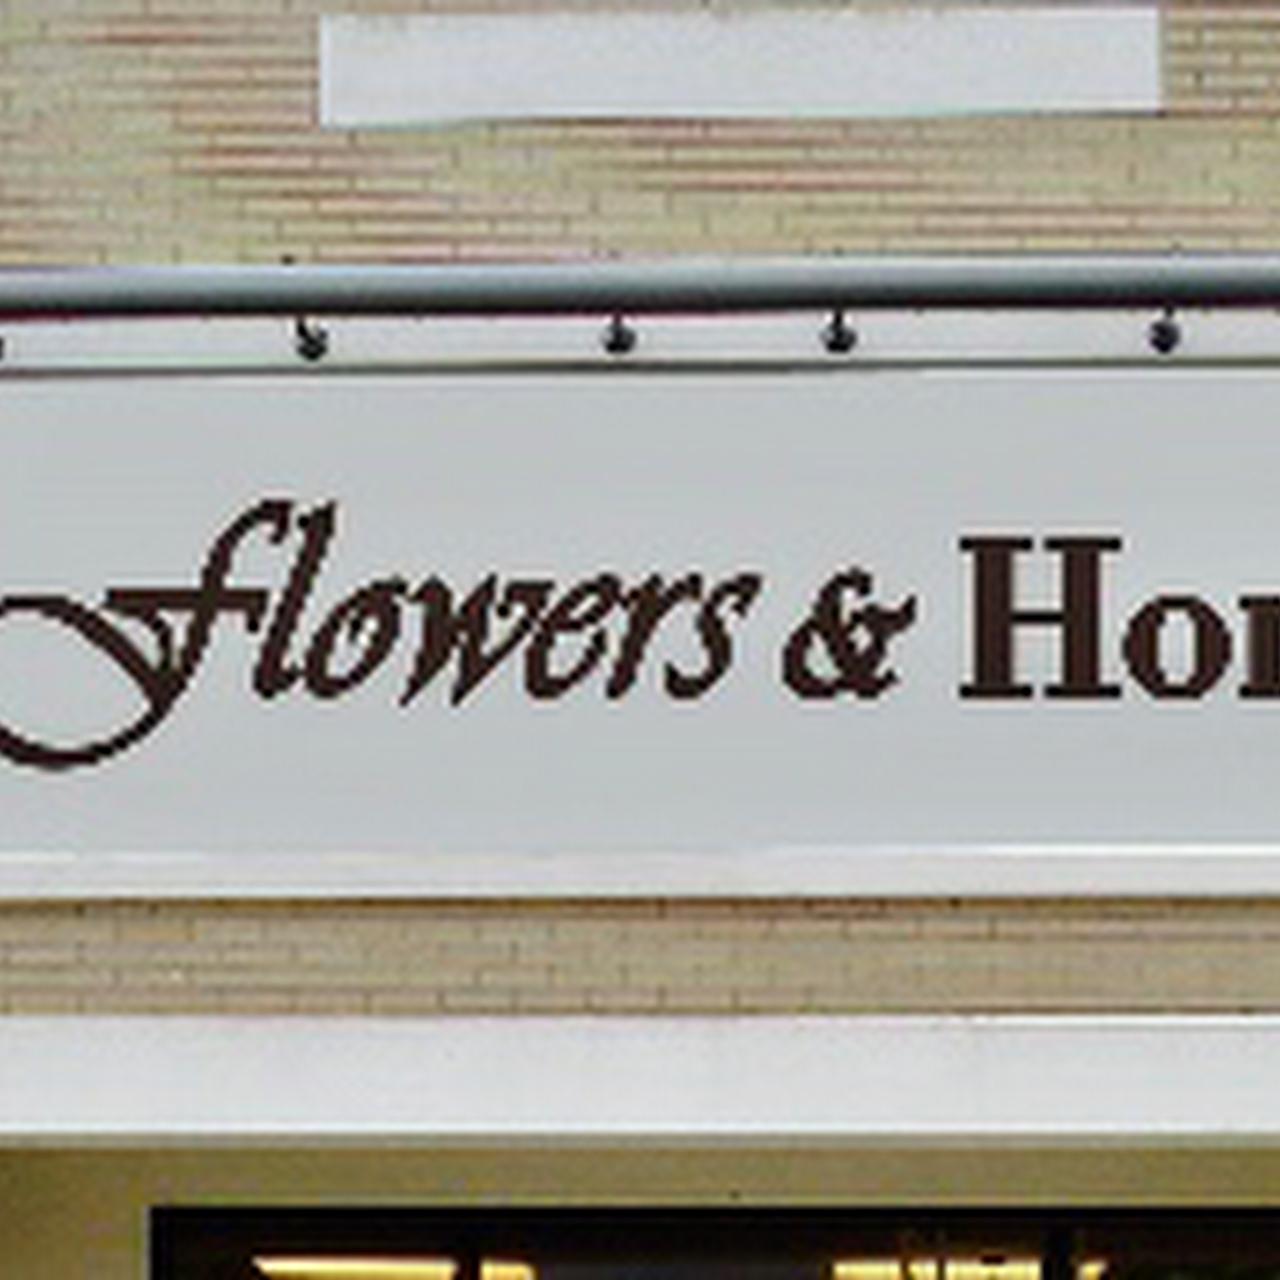 Flowers Home Hot Springs Ar Florist In Hot Springs National Park